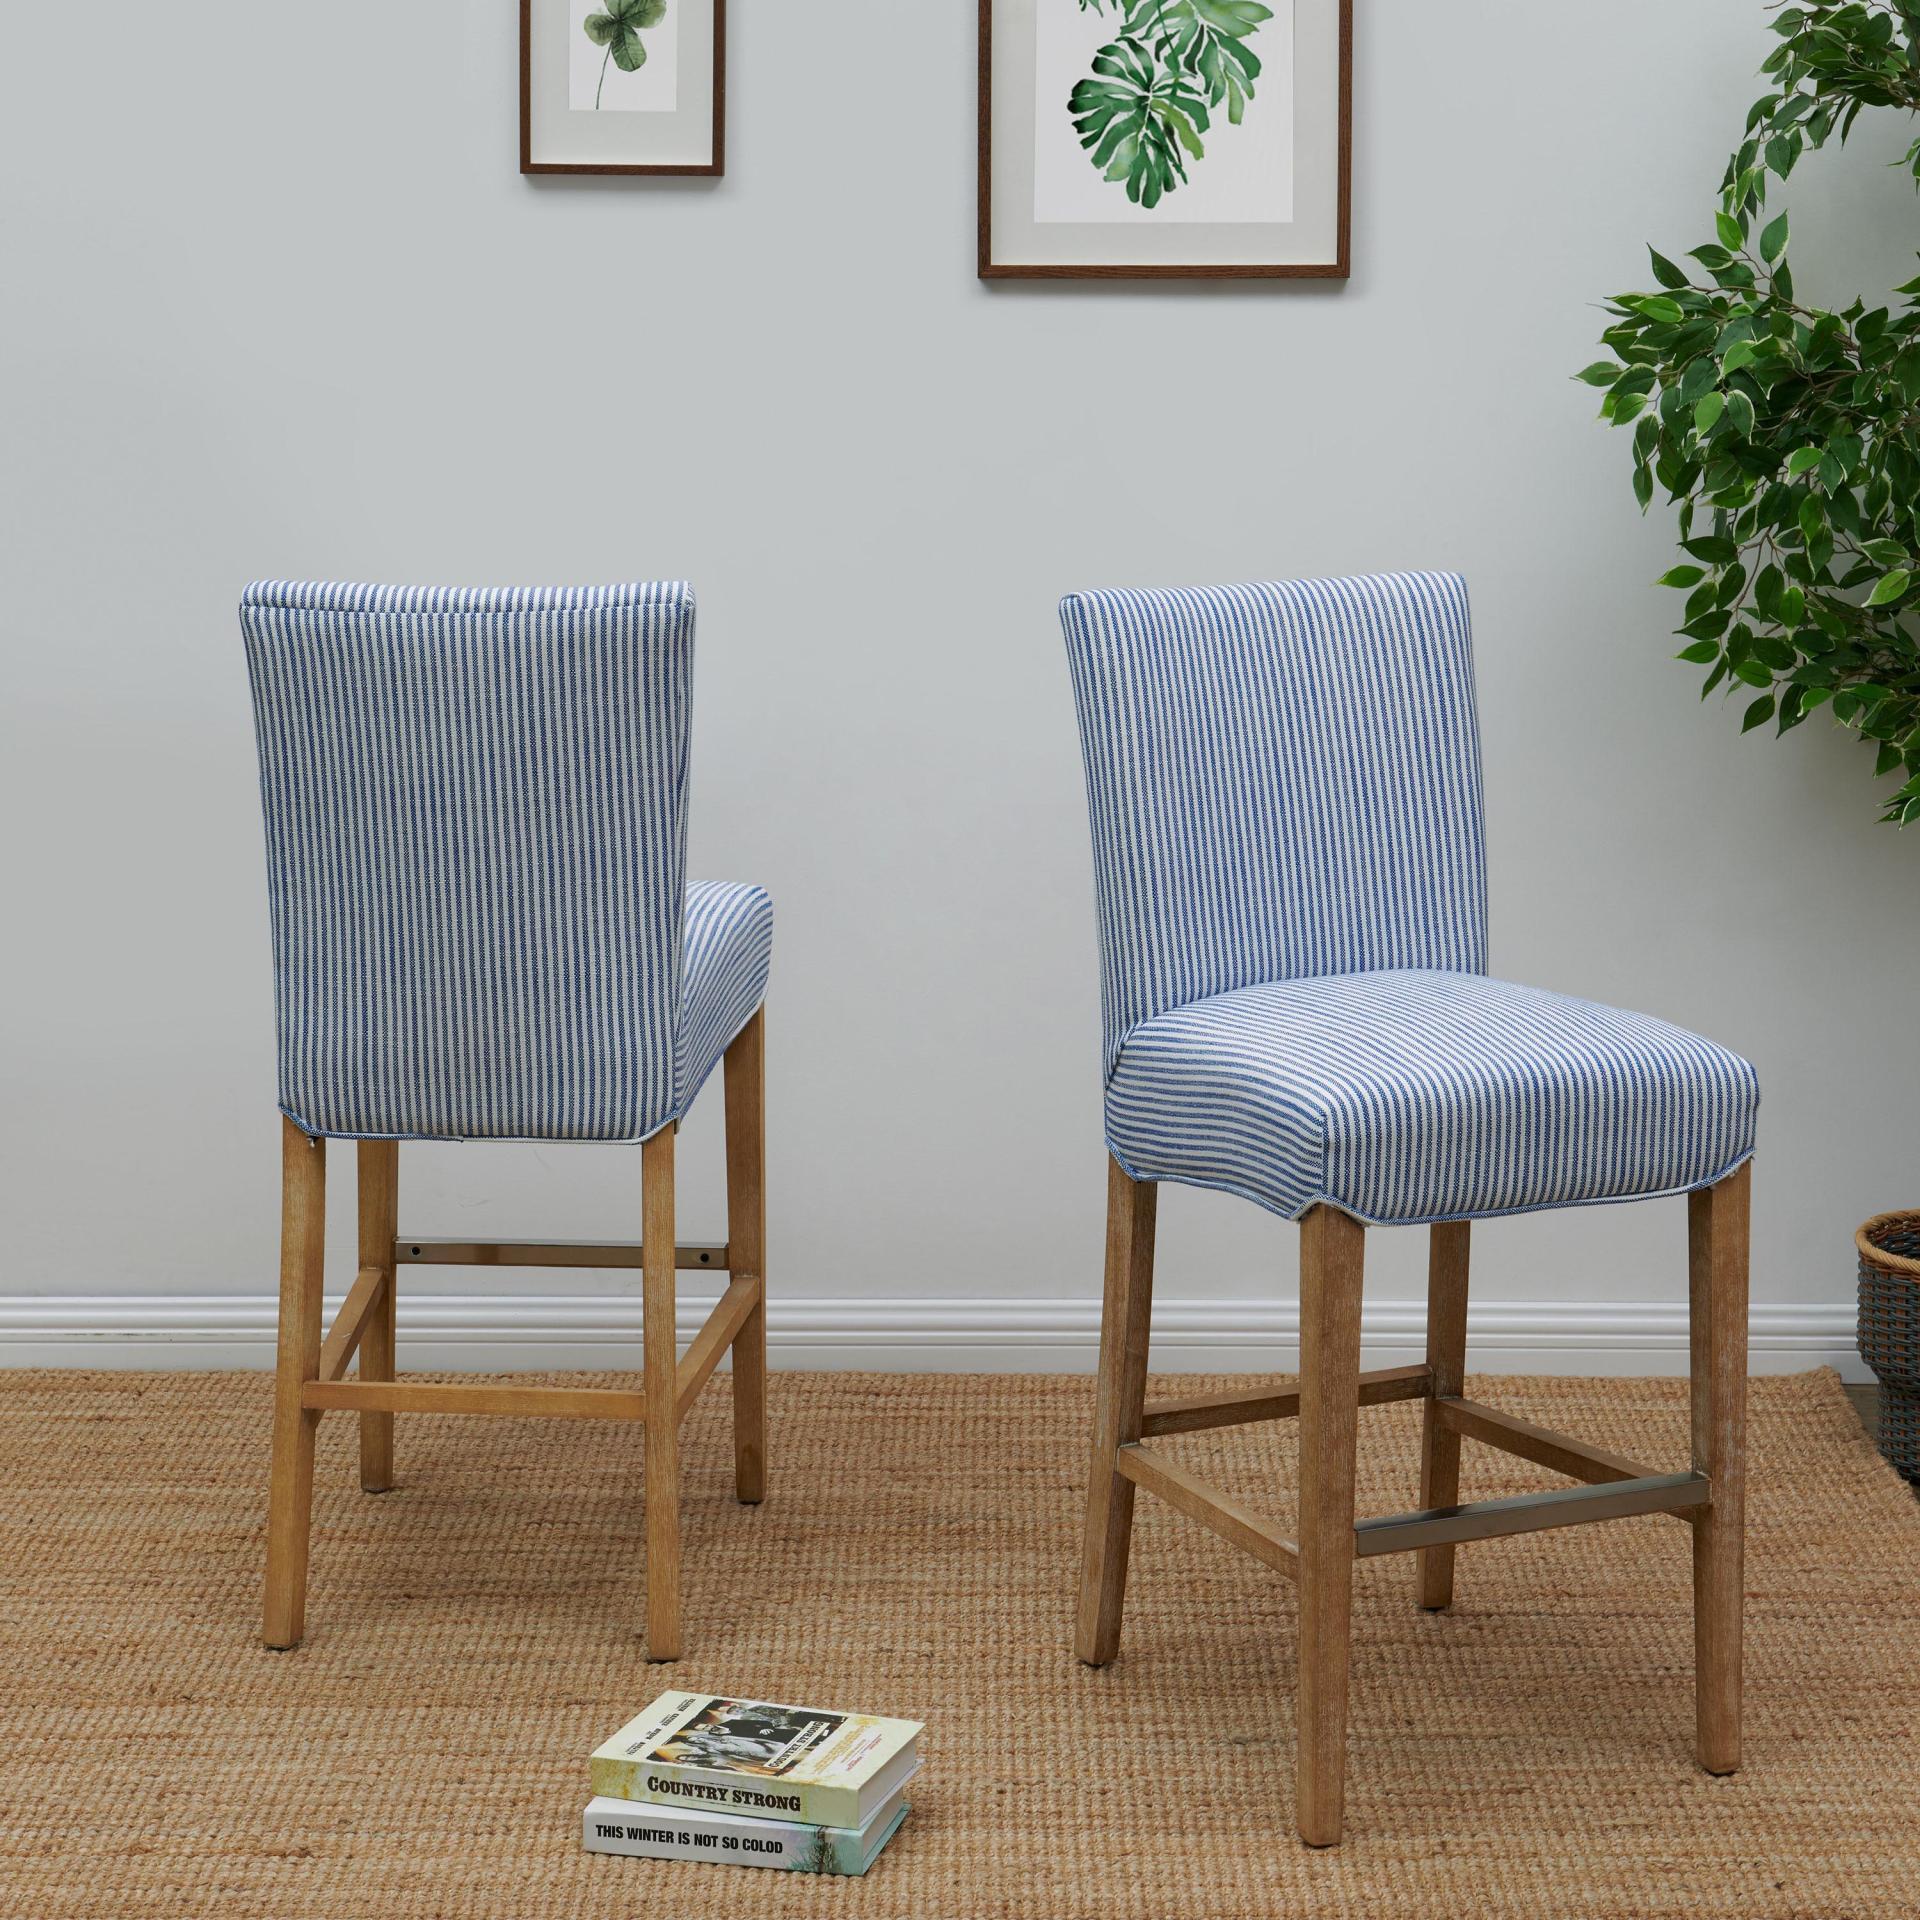 268527 637 N Npd Furniture Wholesale Lifestyle